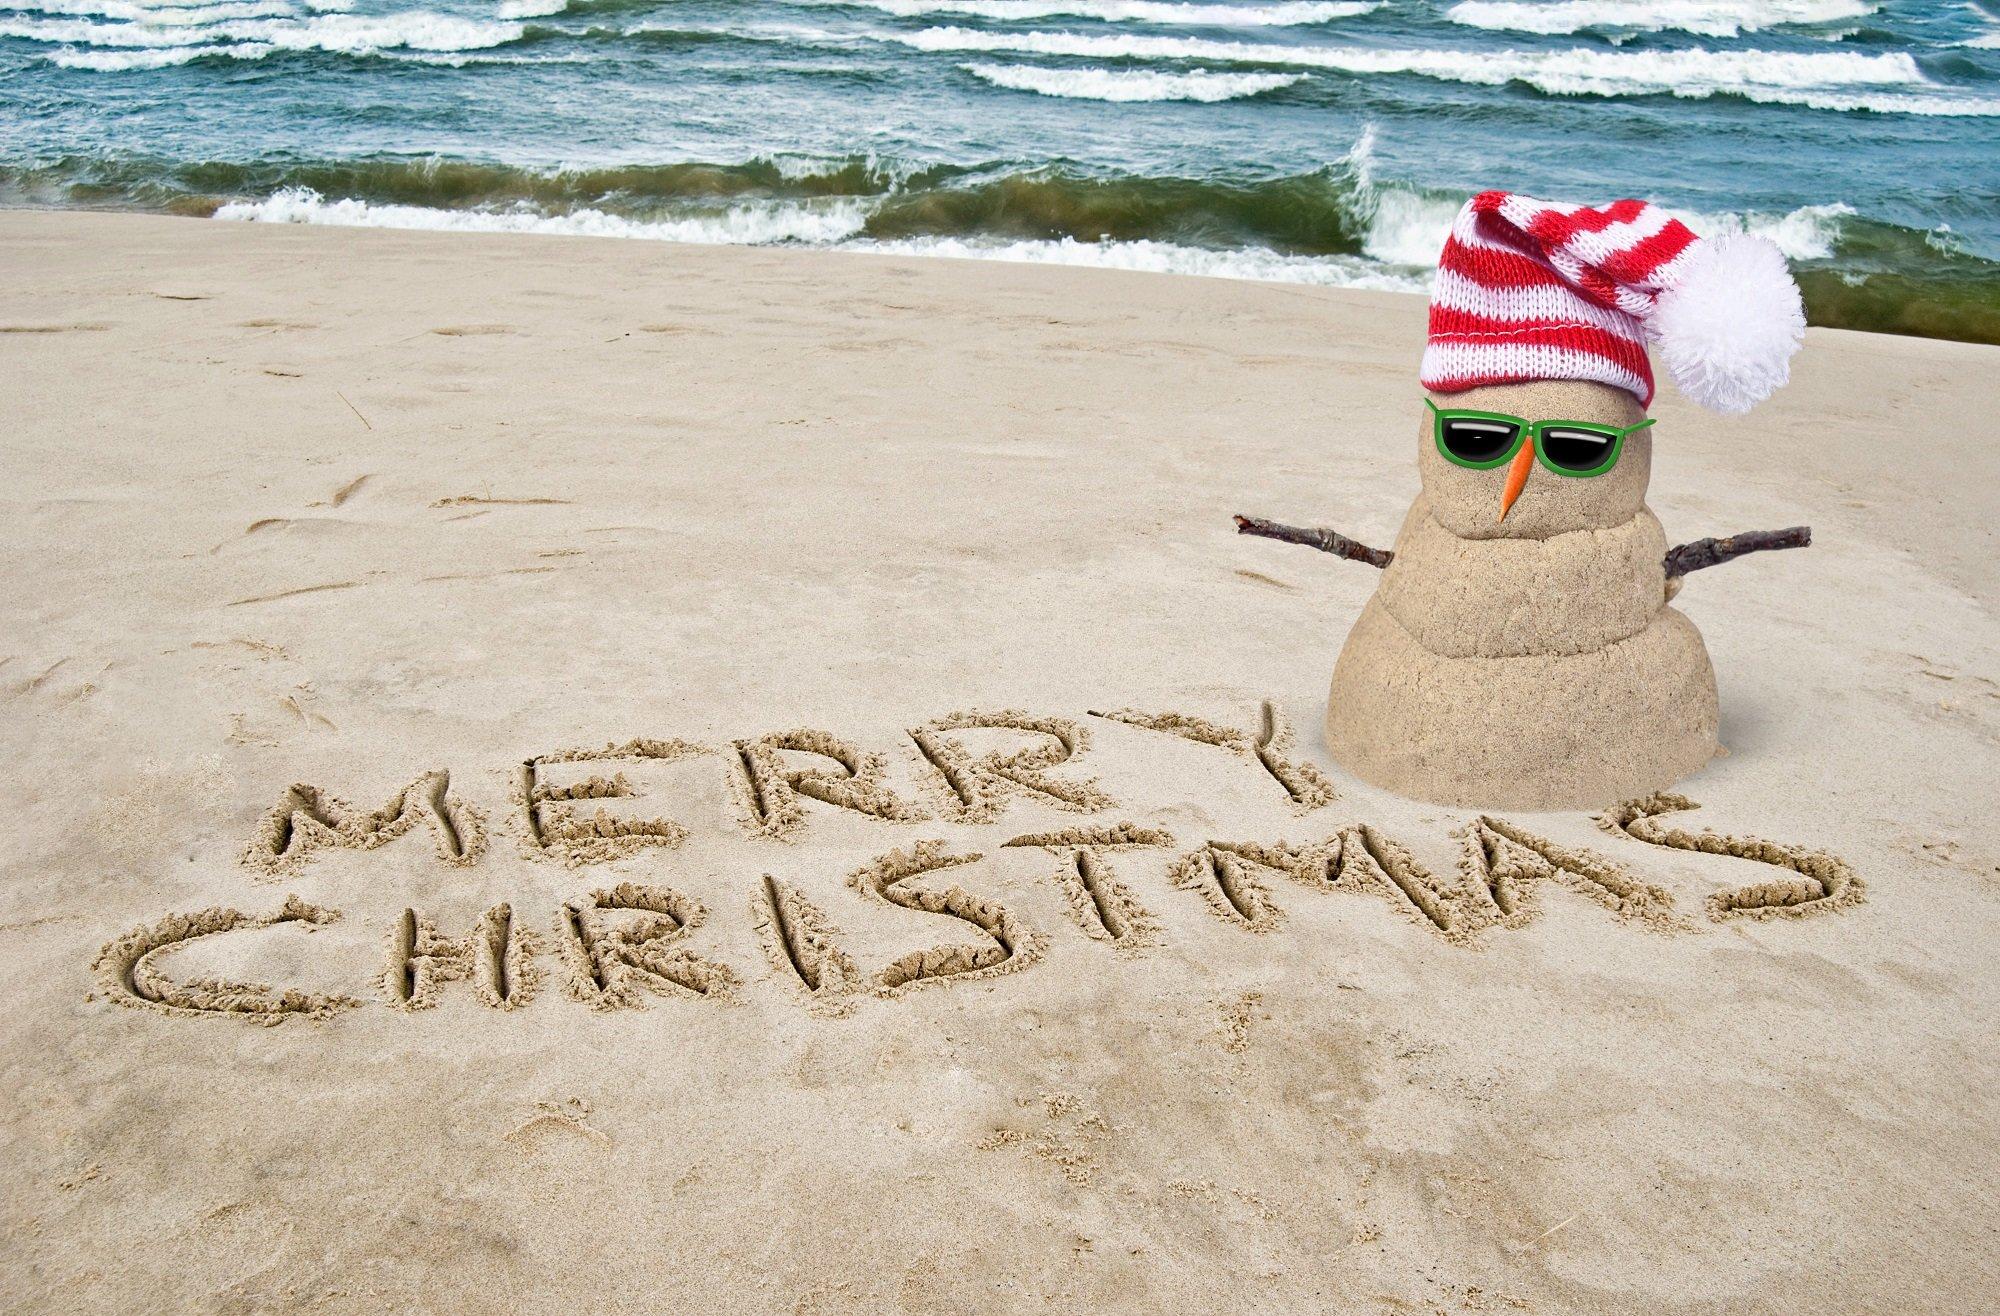 Who Annual Events Calendar World Health Organization Local Christmas In July Events Shorebread